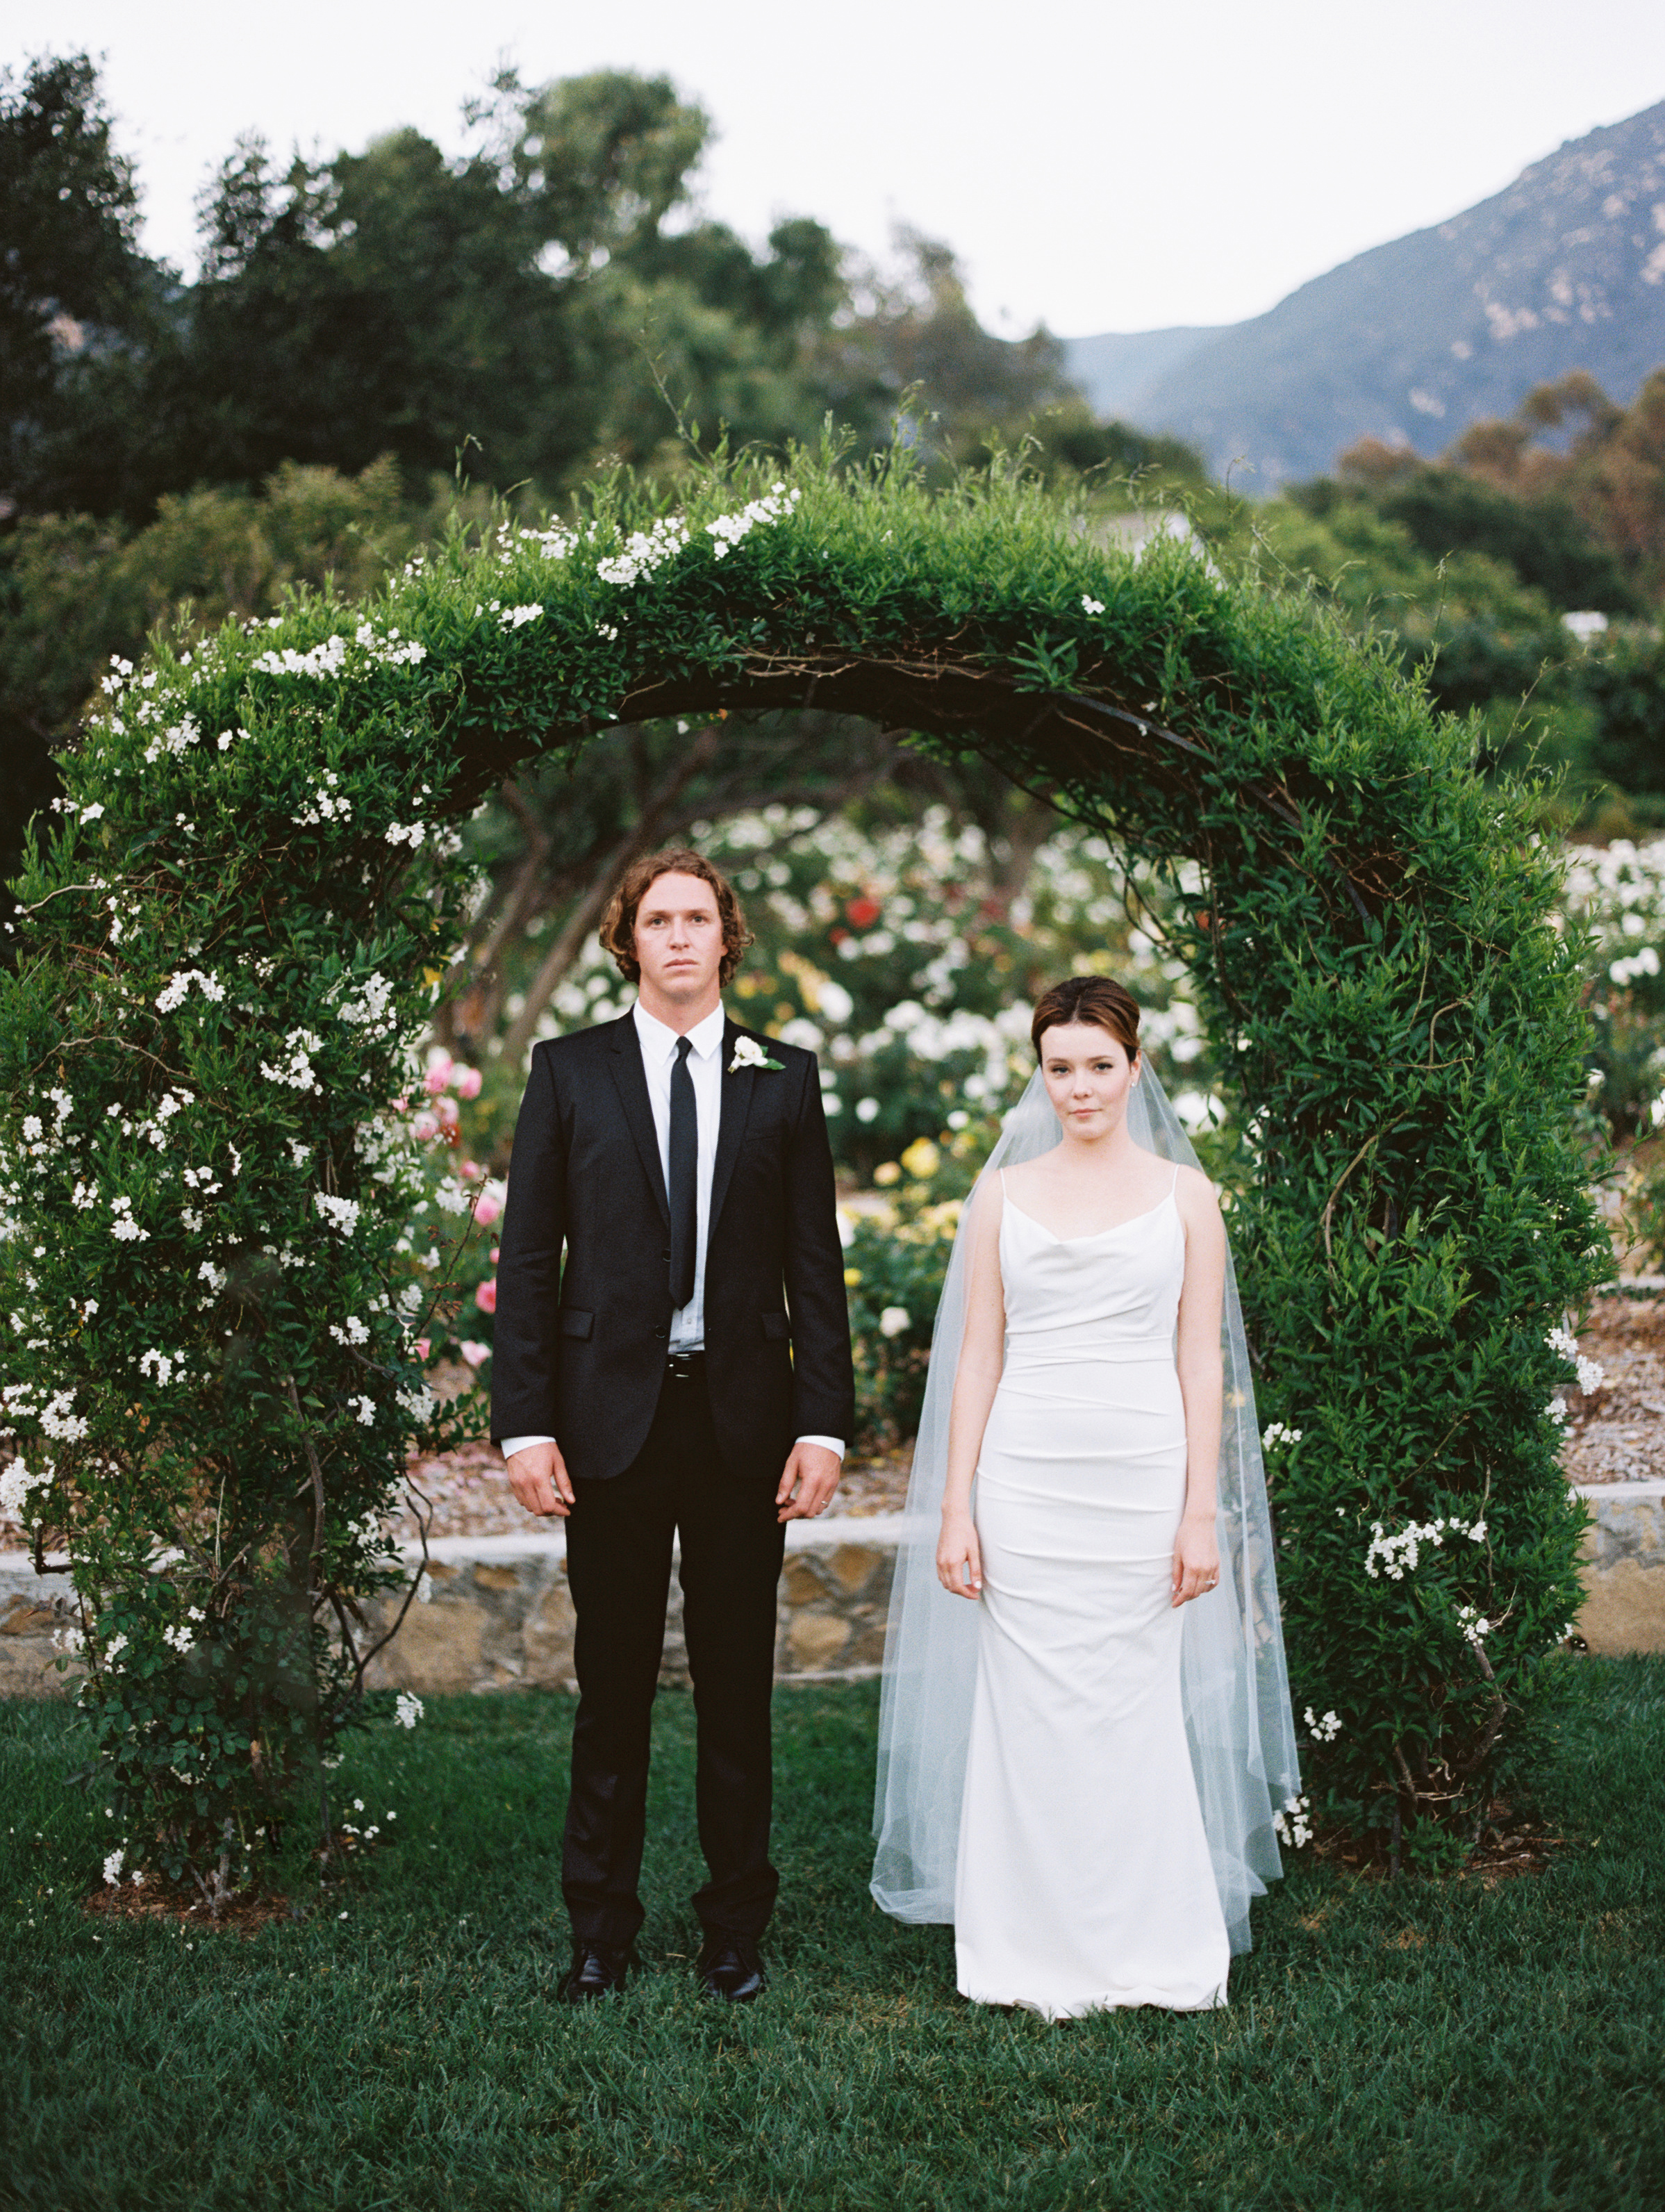 www.santabarbarawedding.com | San Ysidro Ranch | Pat Moyer Photography | Bride and Groom